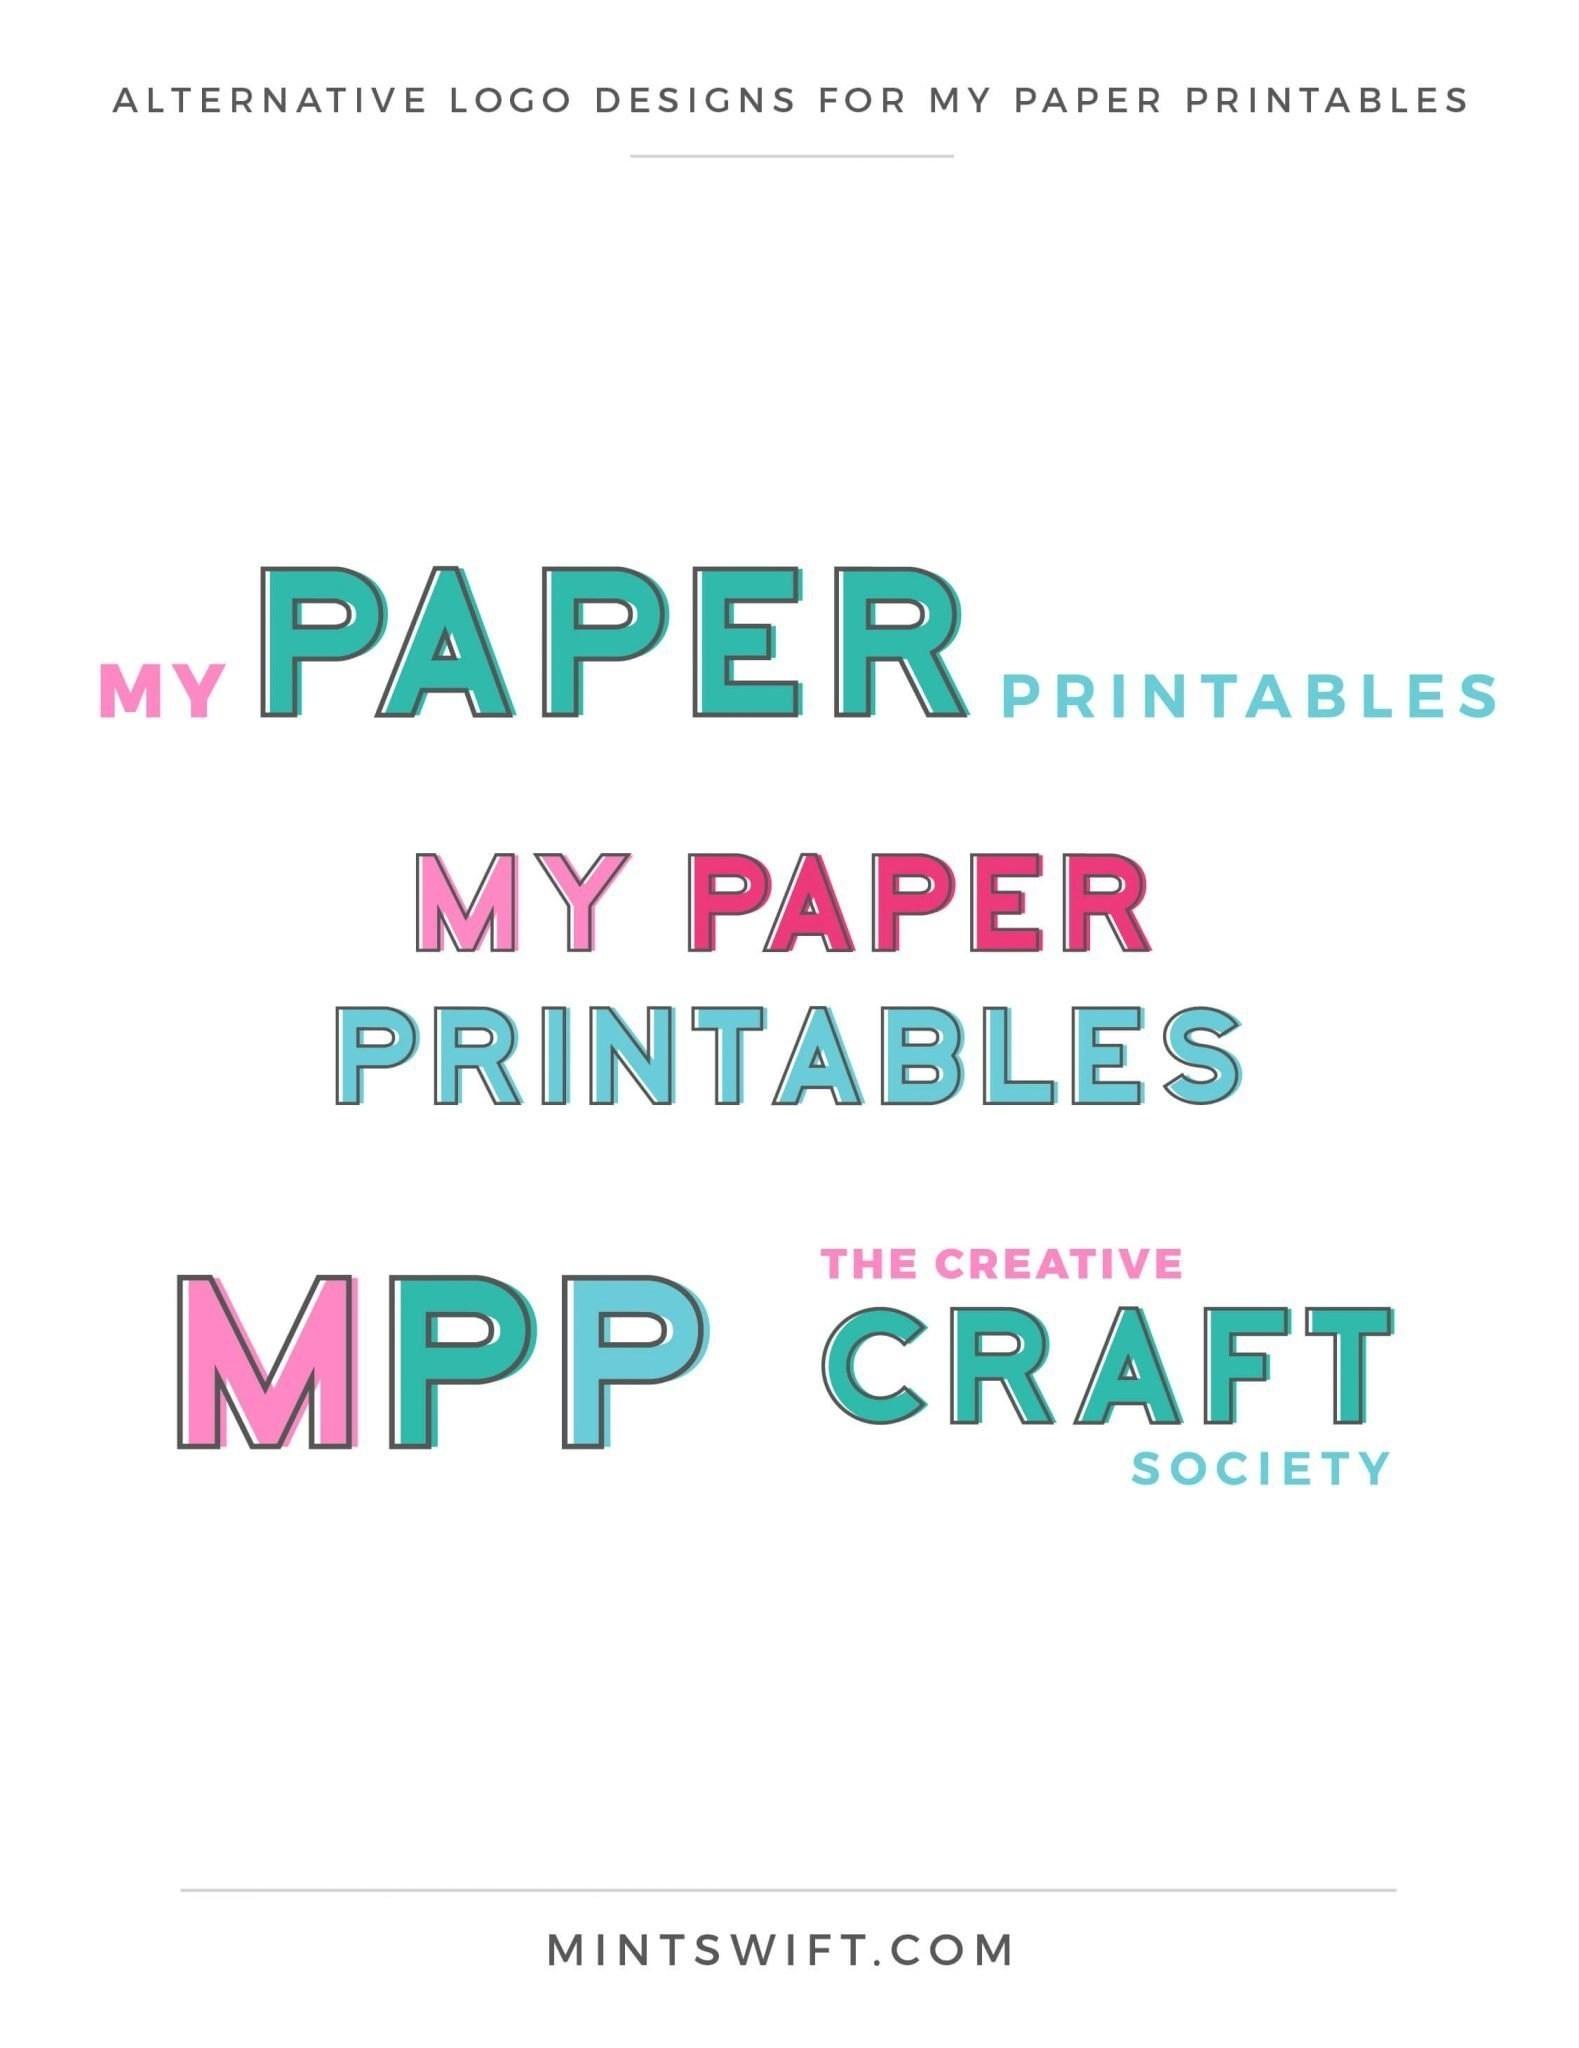 My Paper Printables - Alternative Logo Designs - Brand Design - MintSwift